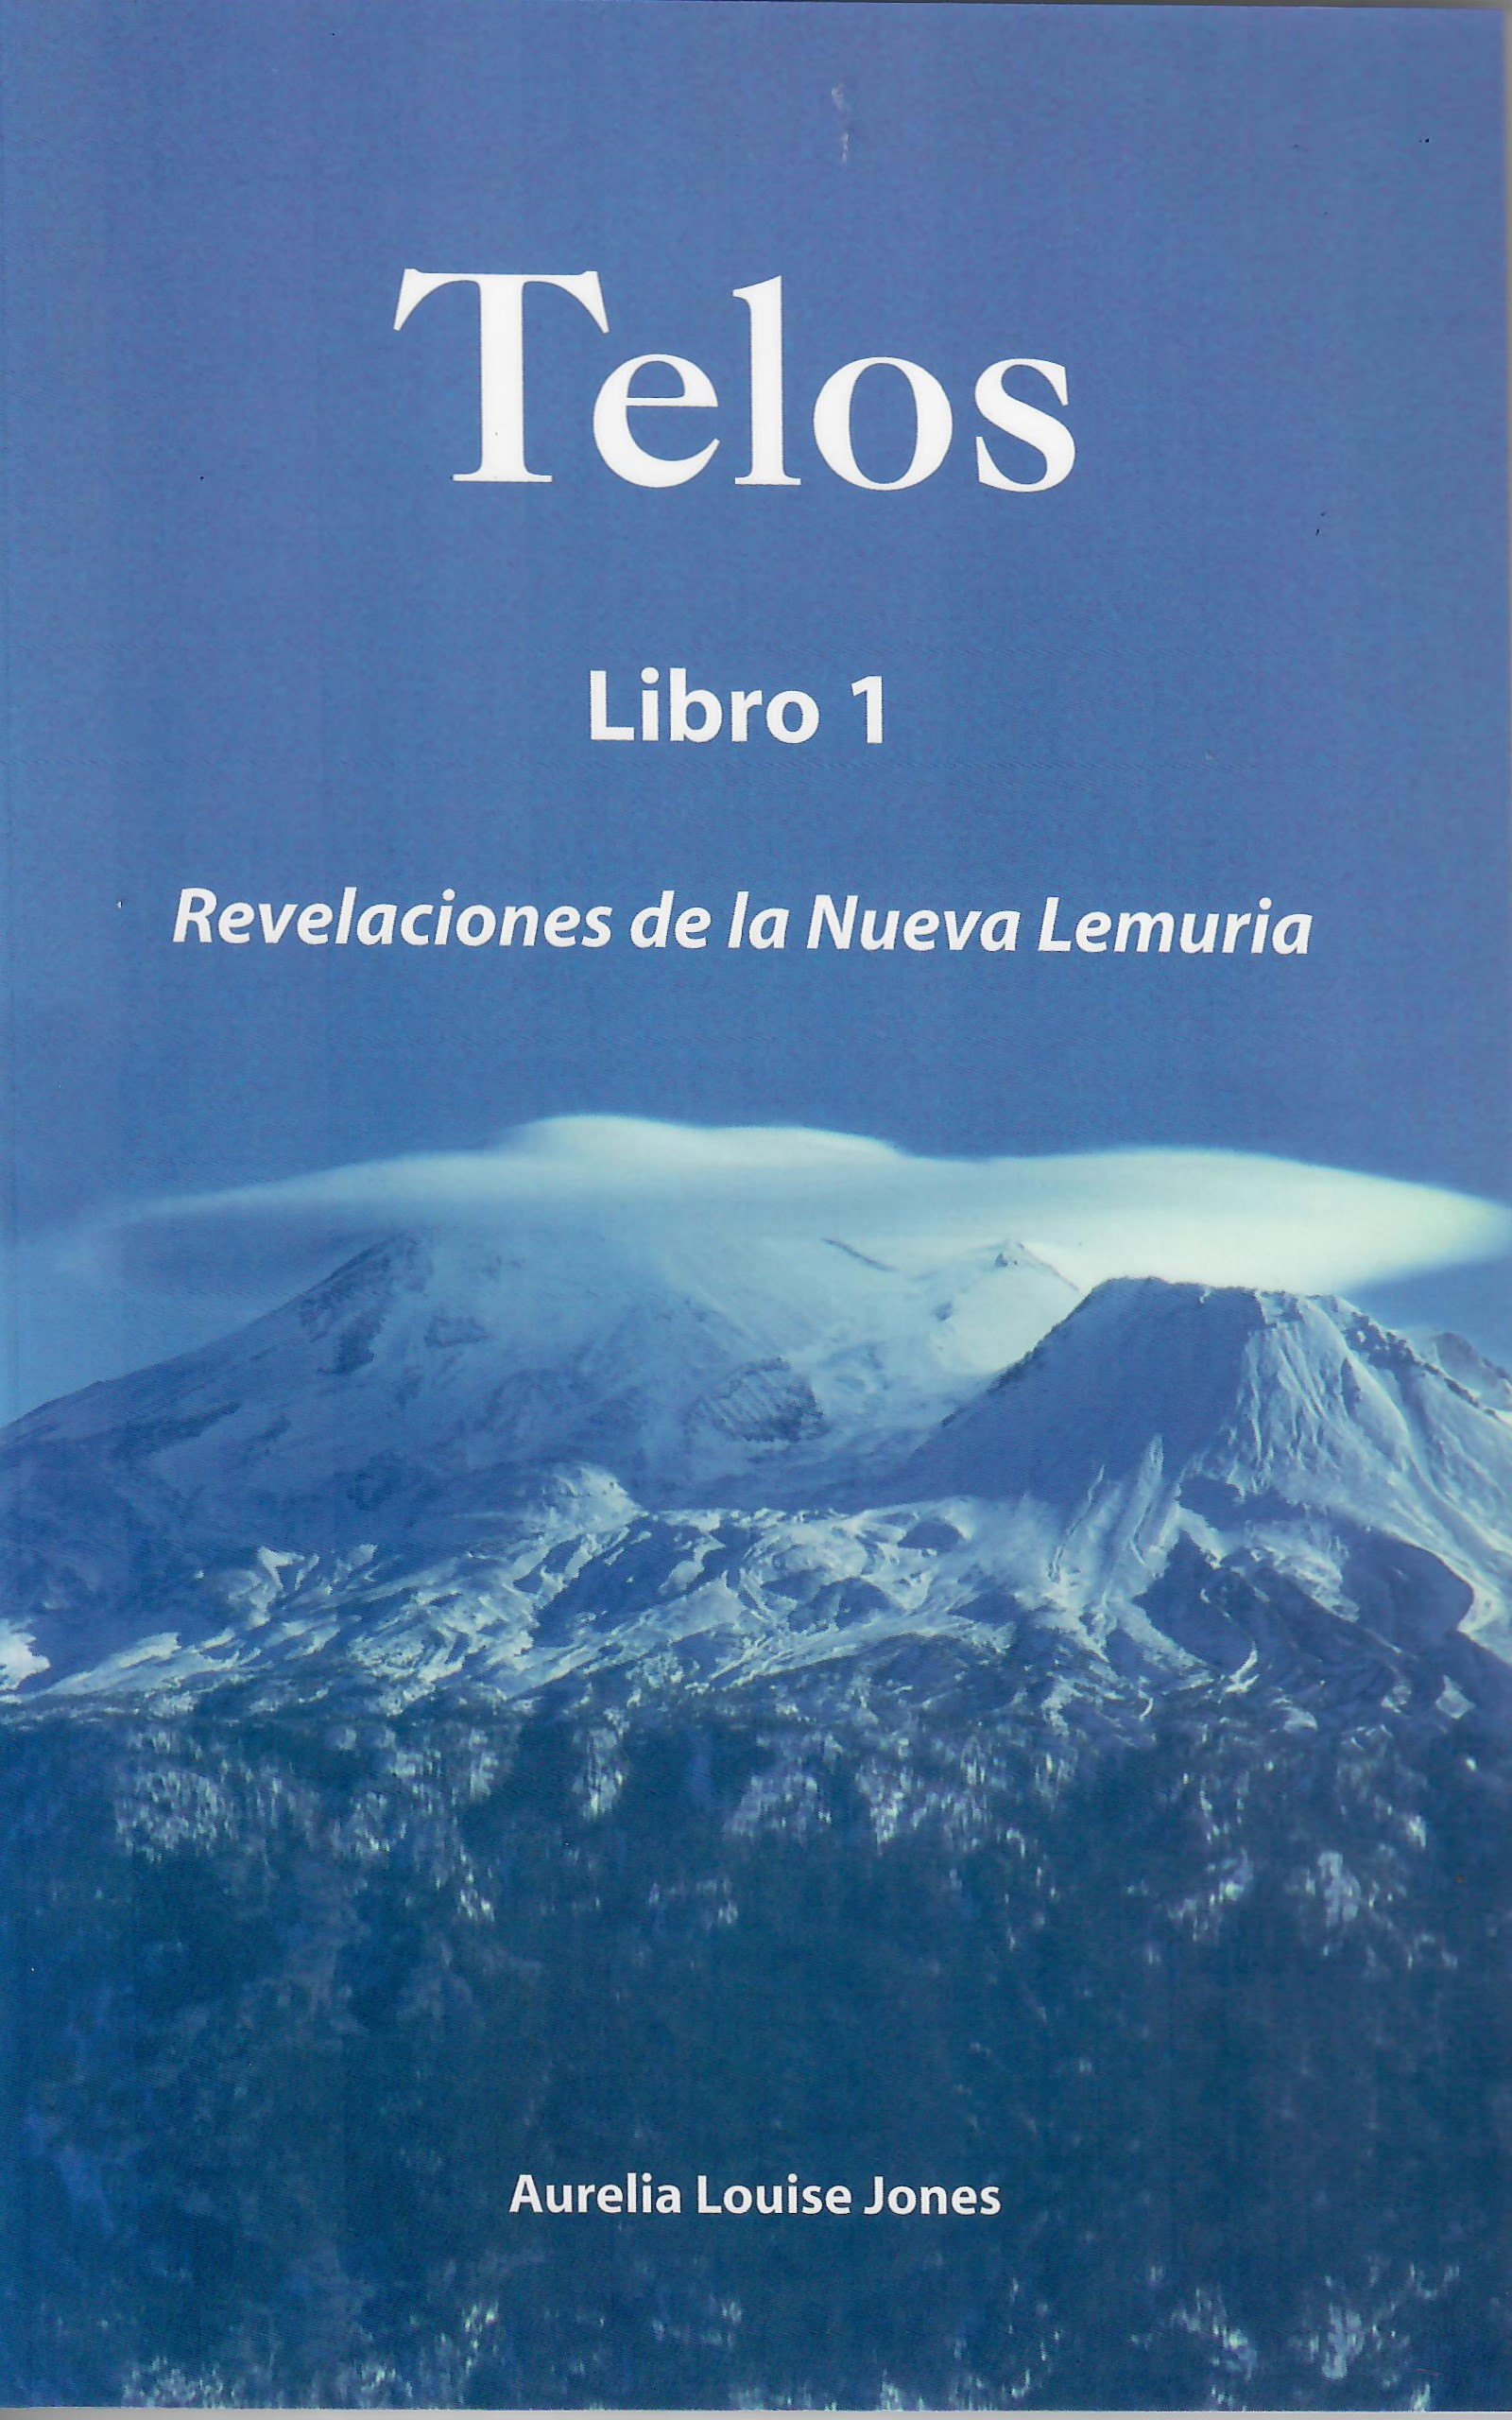 telos-libro-1.jpg